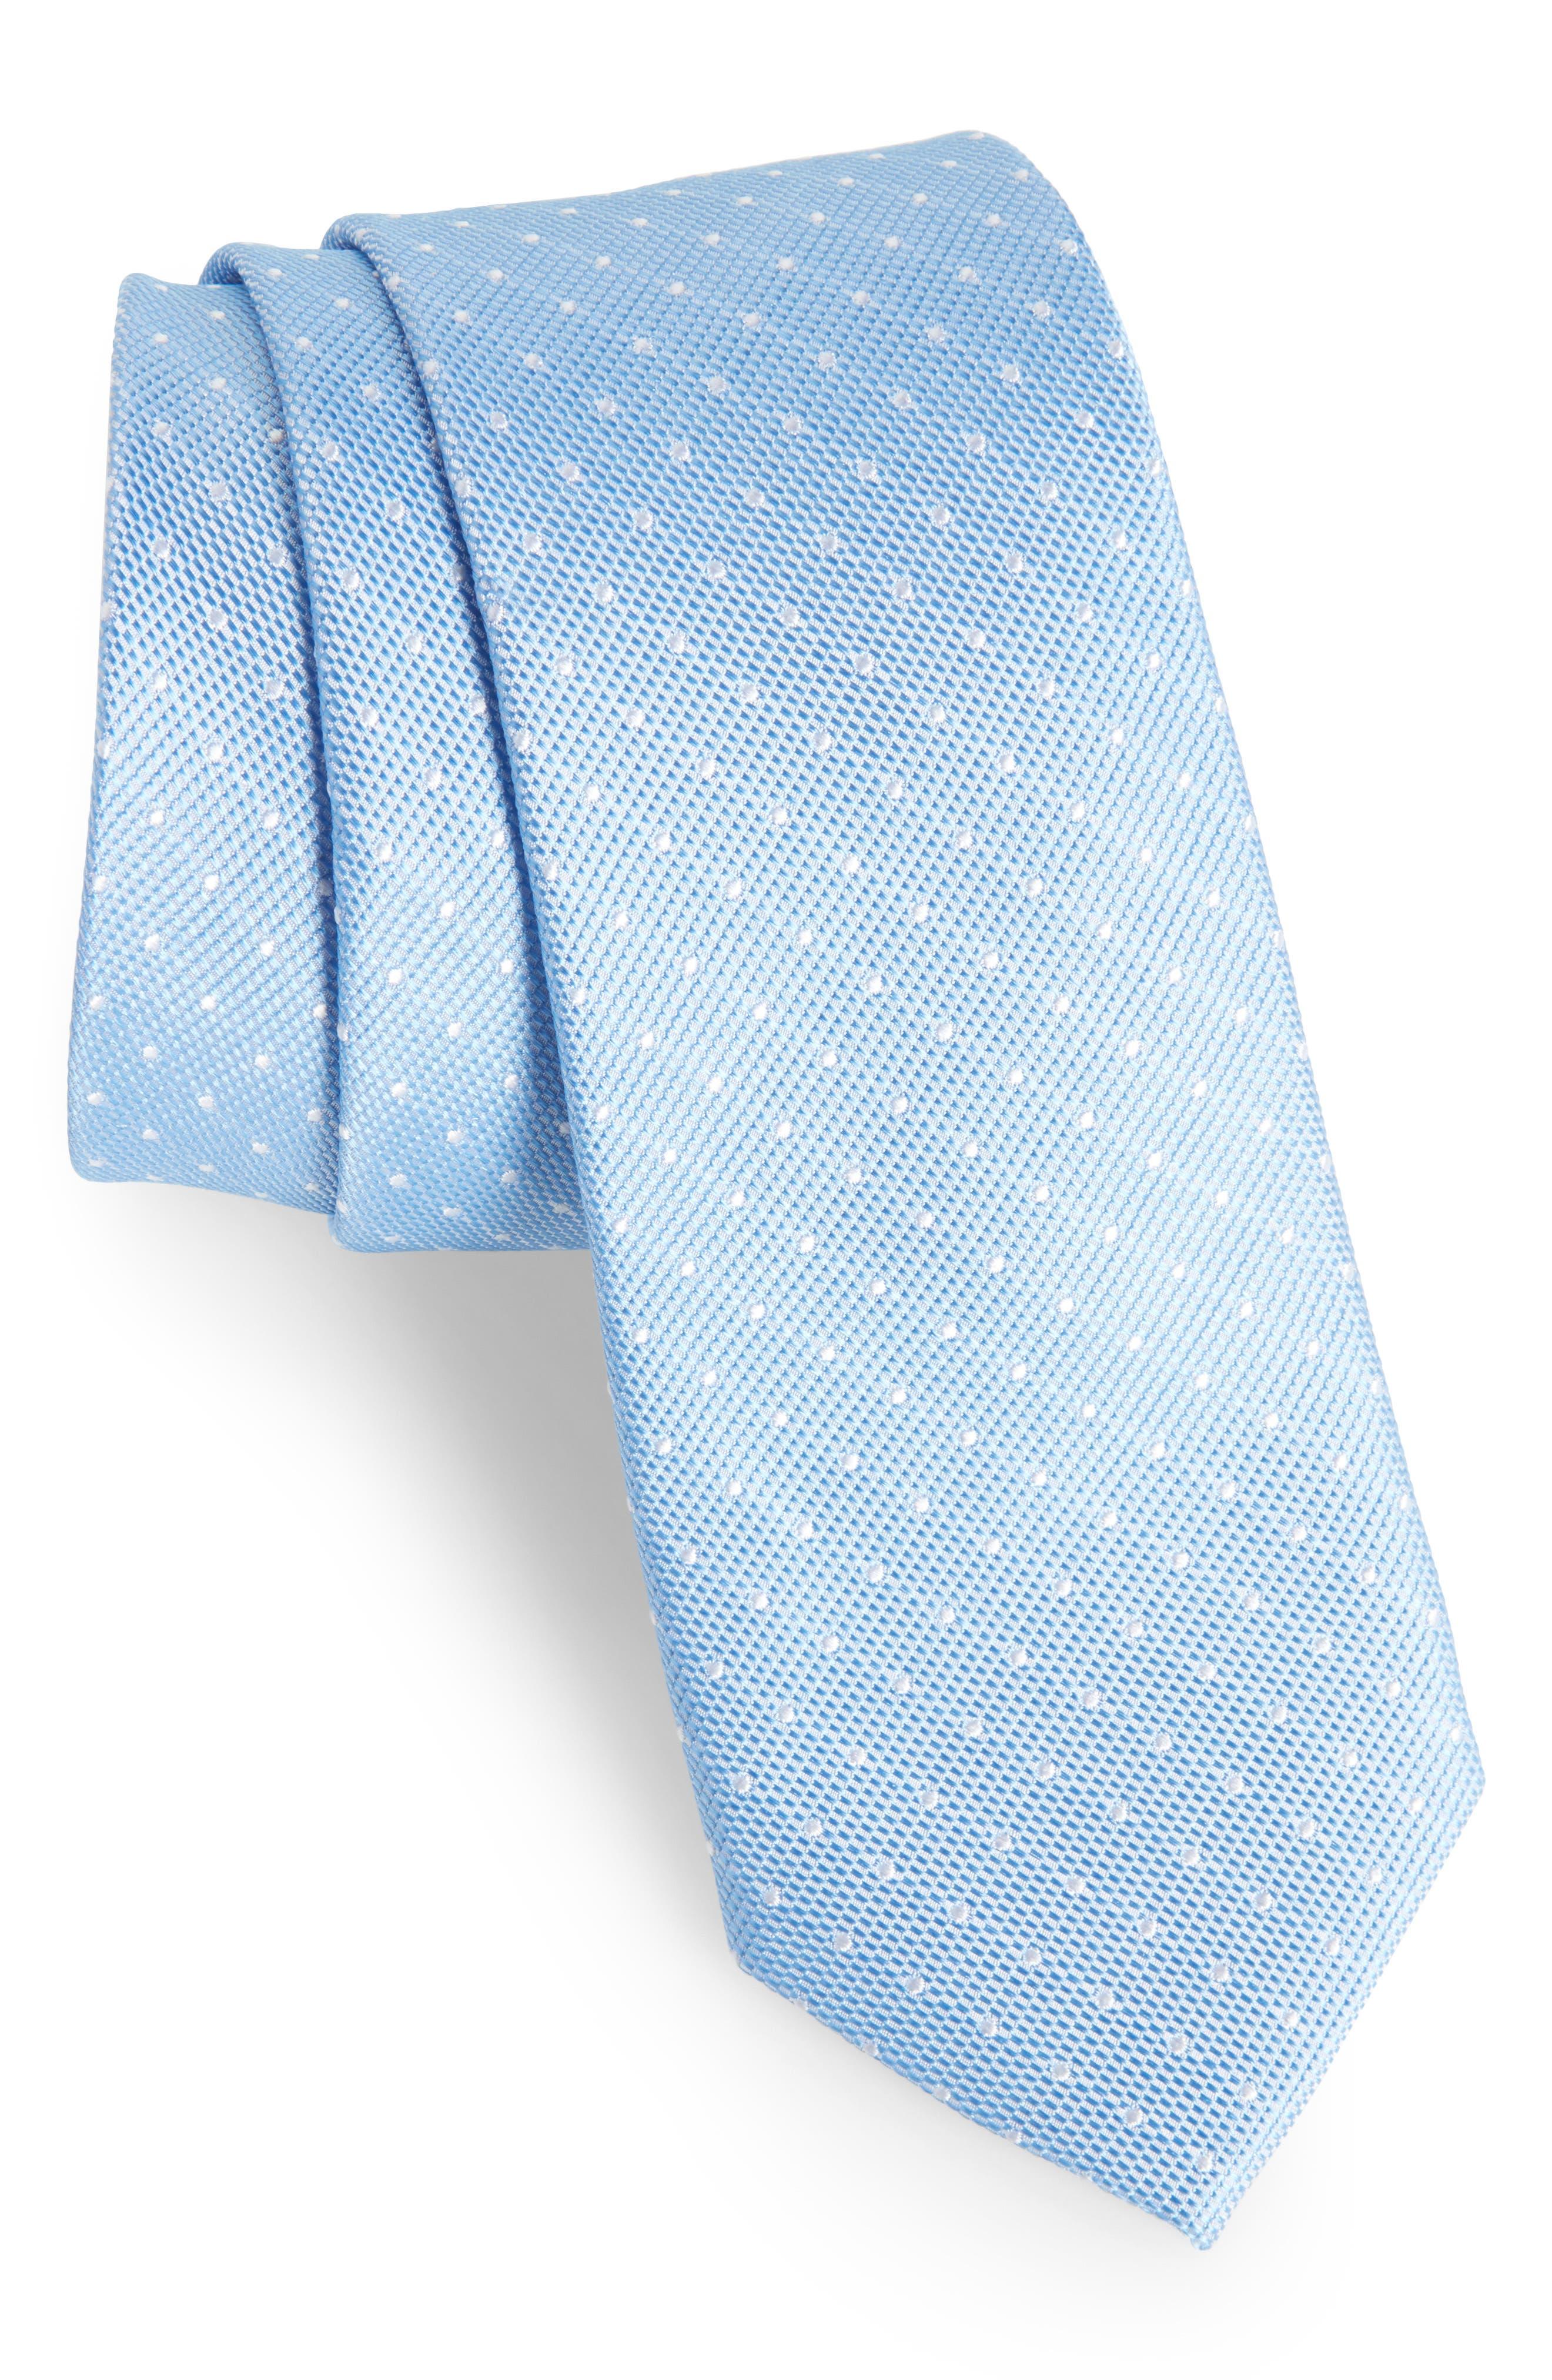 Paseo Dot Silk Skinny Tie,                         Main,                         color, Blue